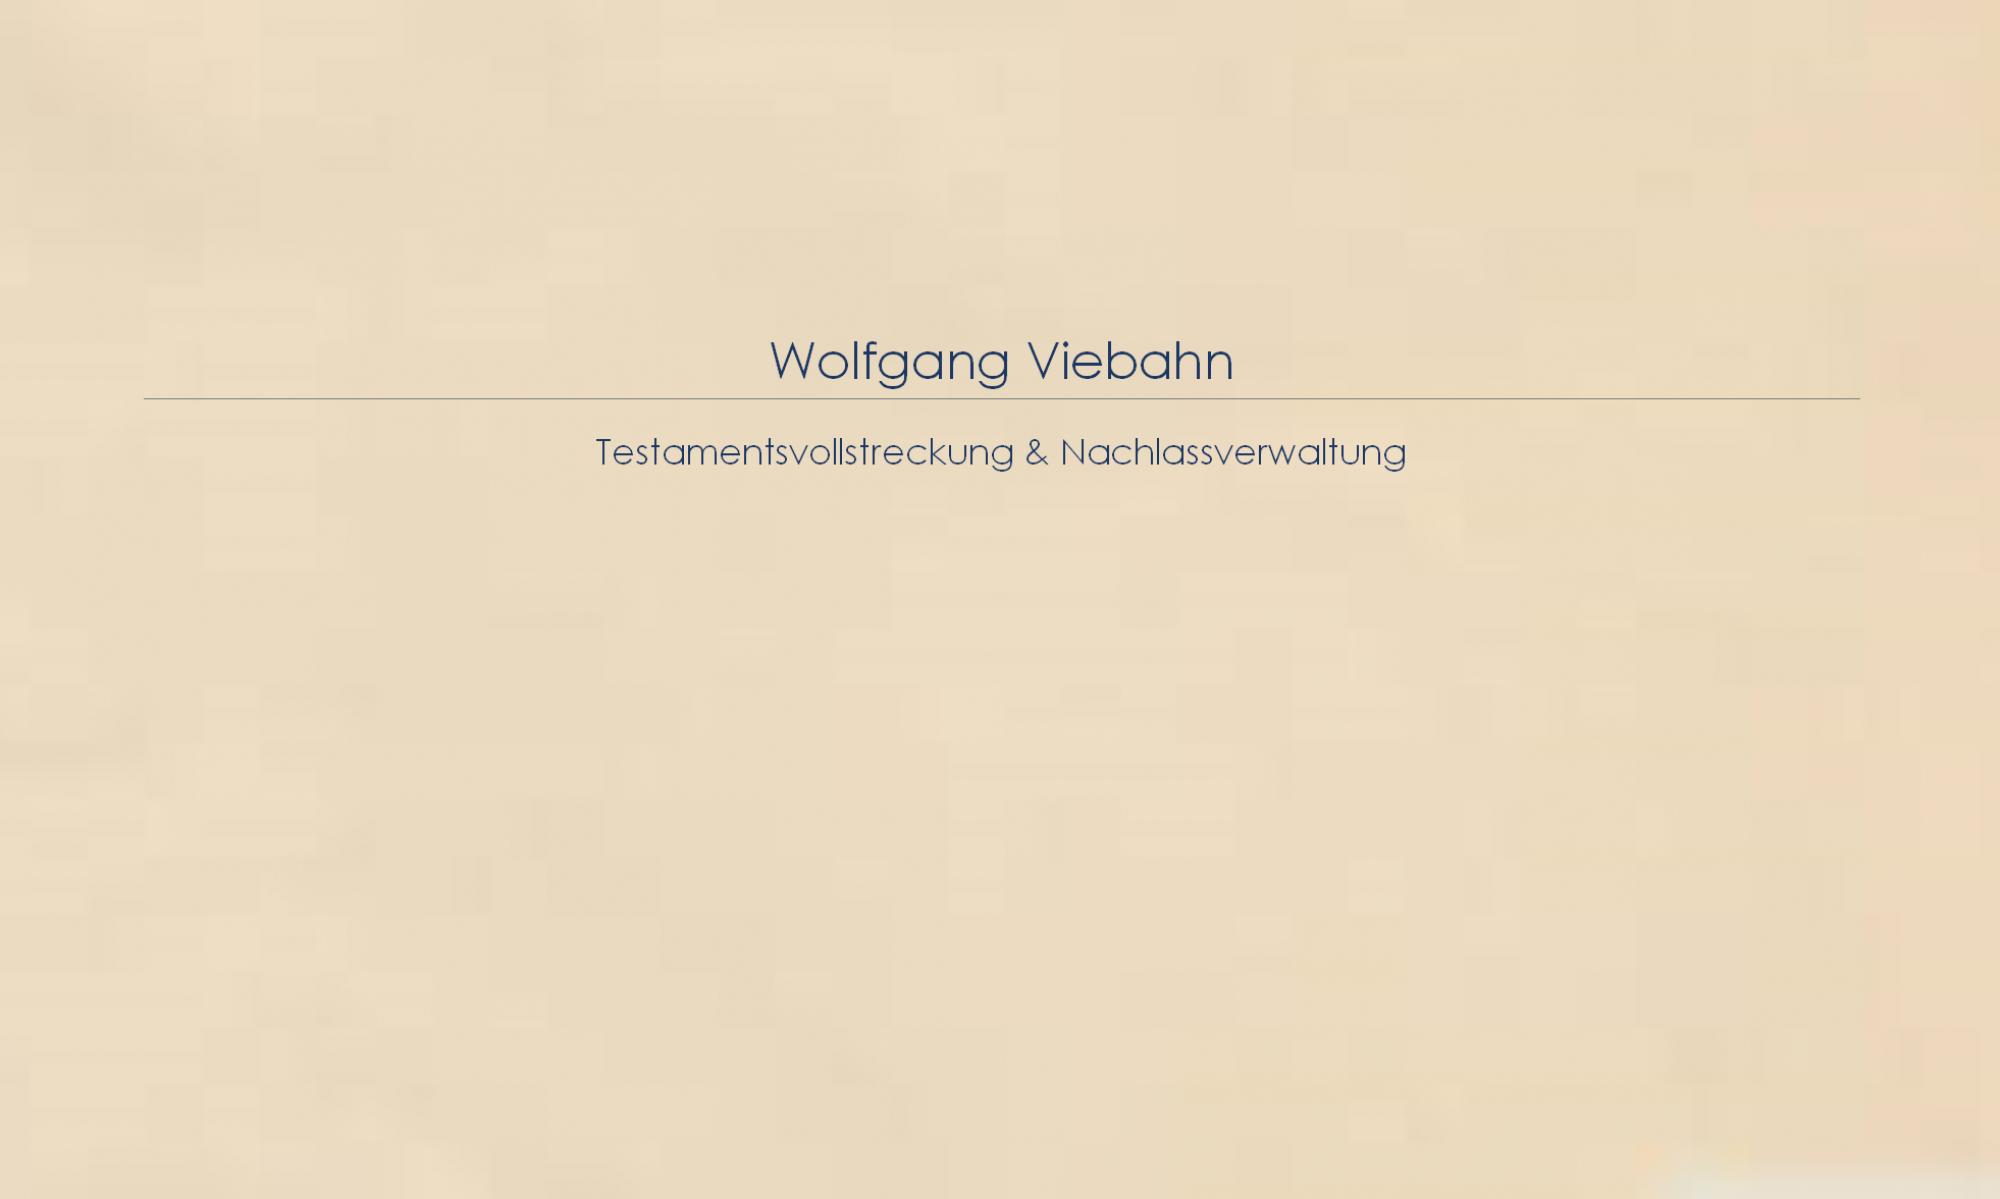 Wolfgang Viebahn